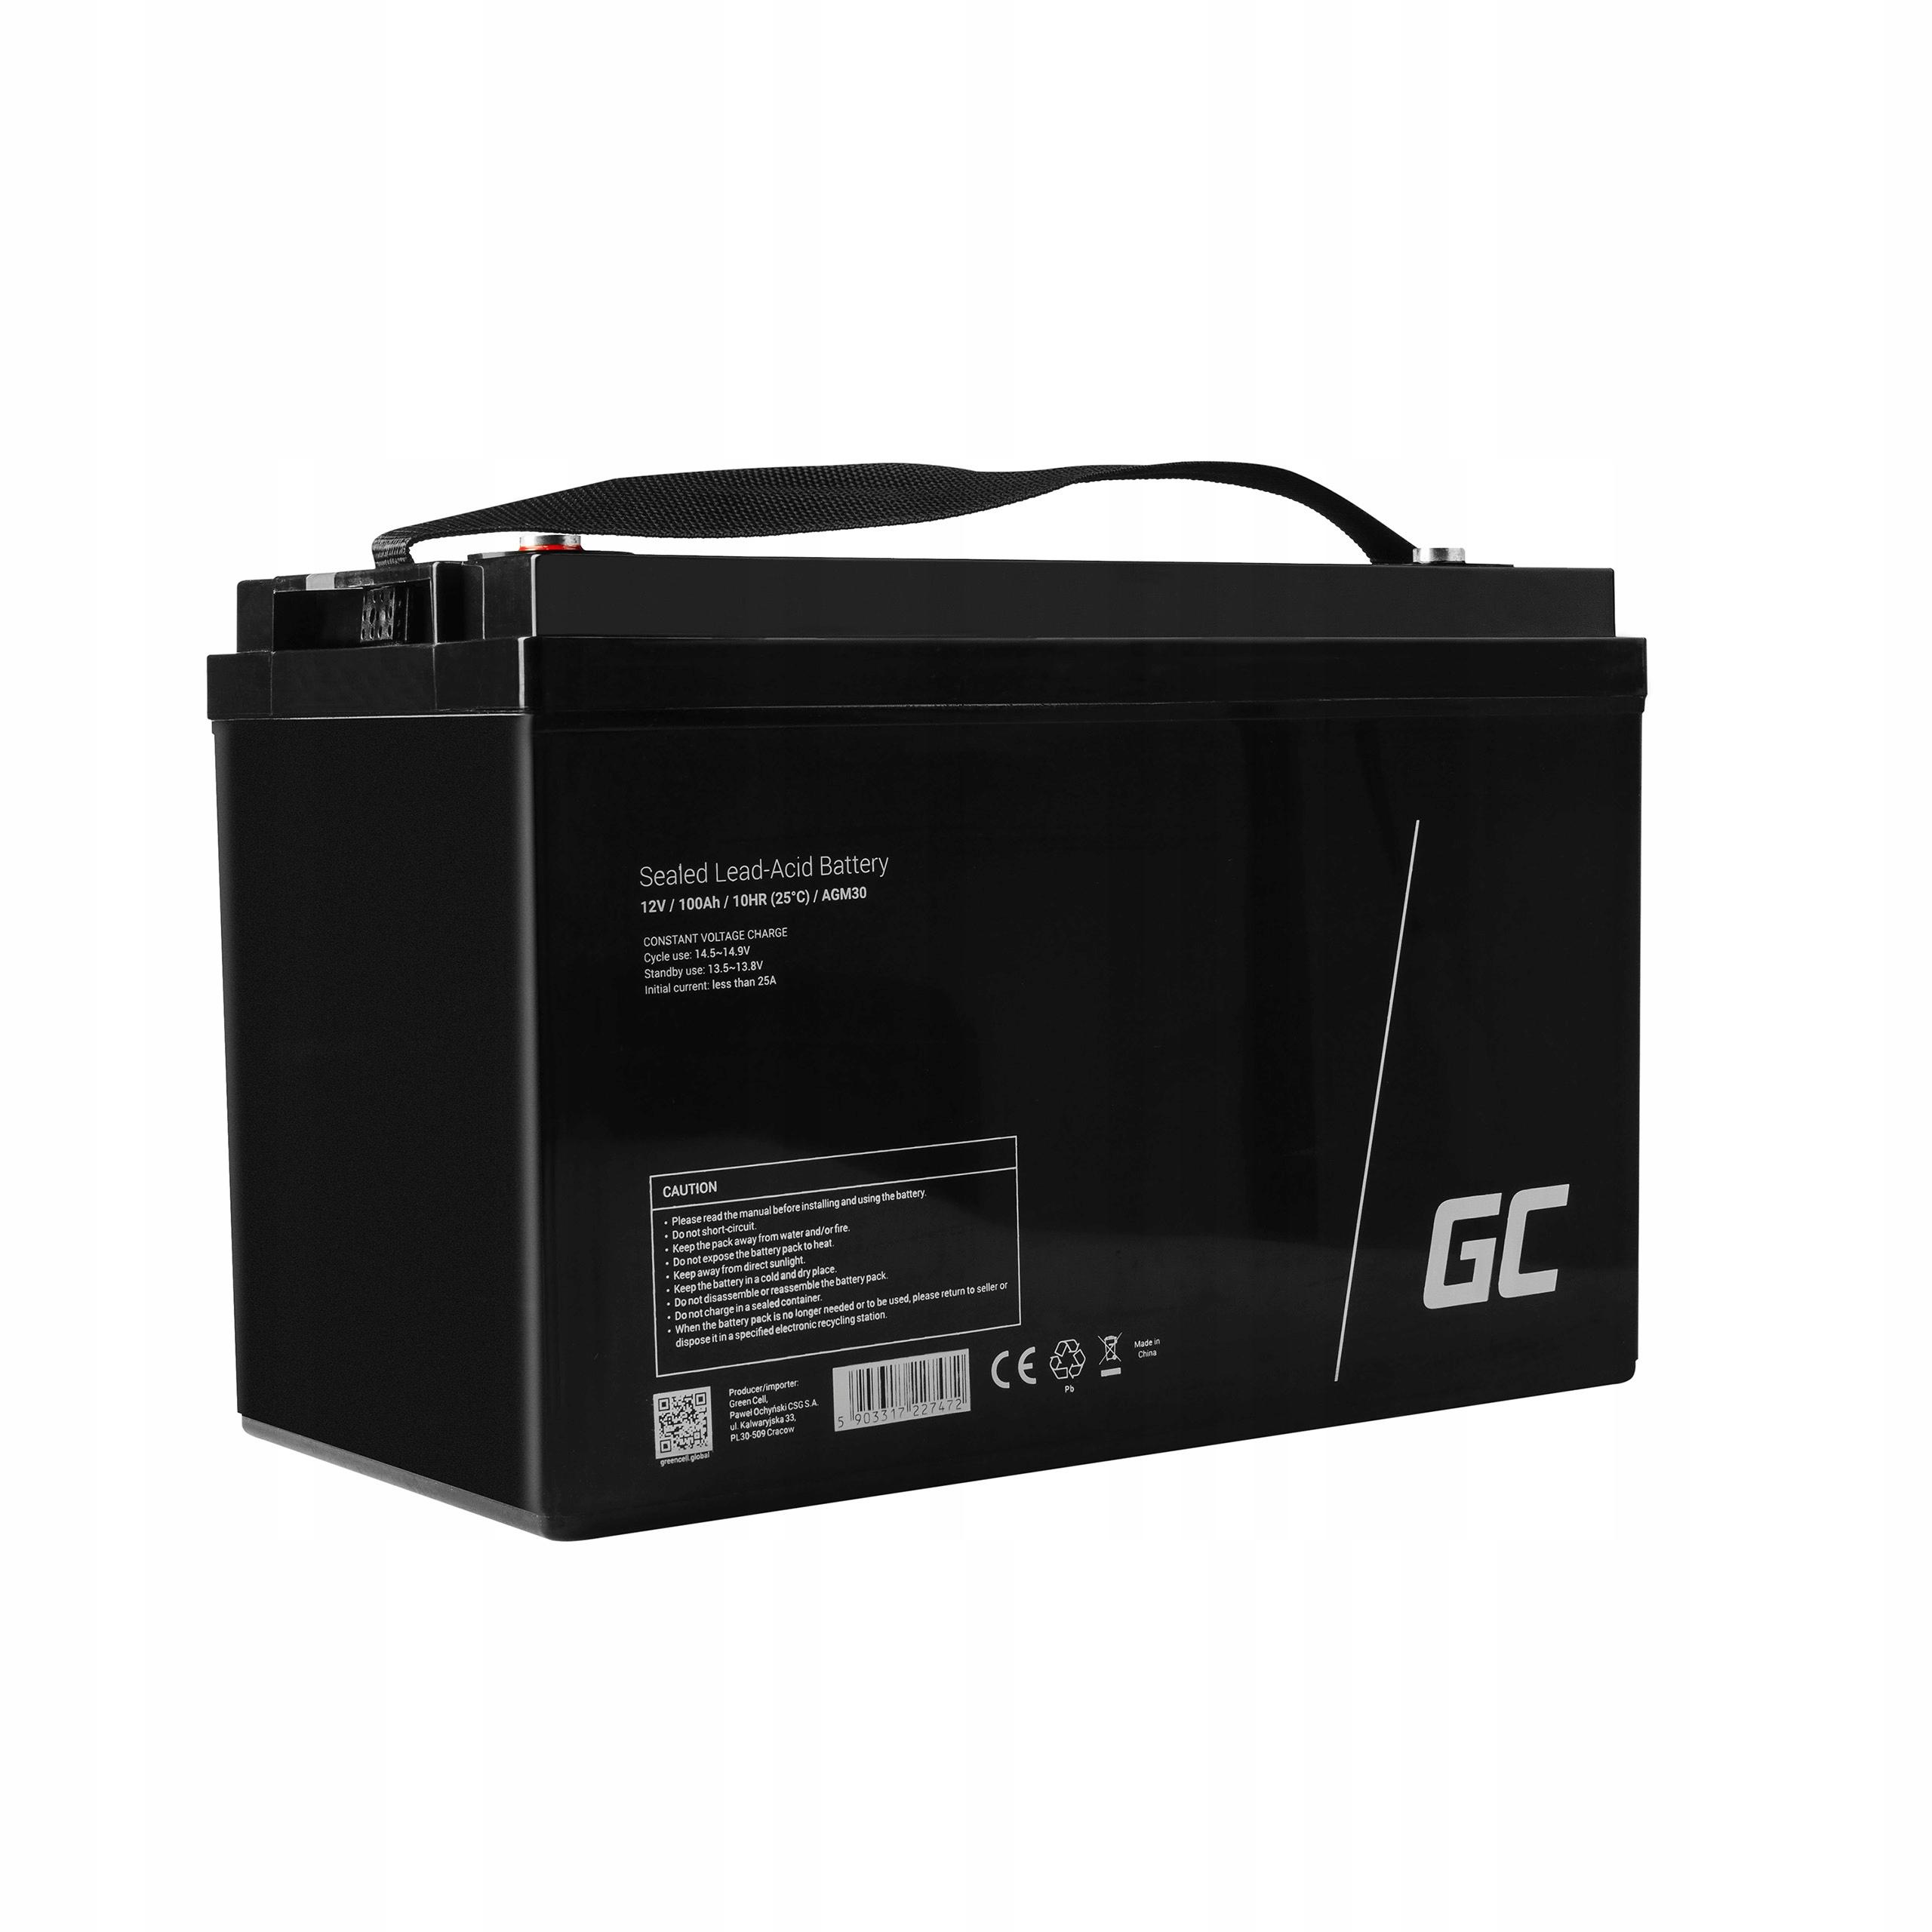 Аккумулятор AGM для швертбота 12V 100Ah